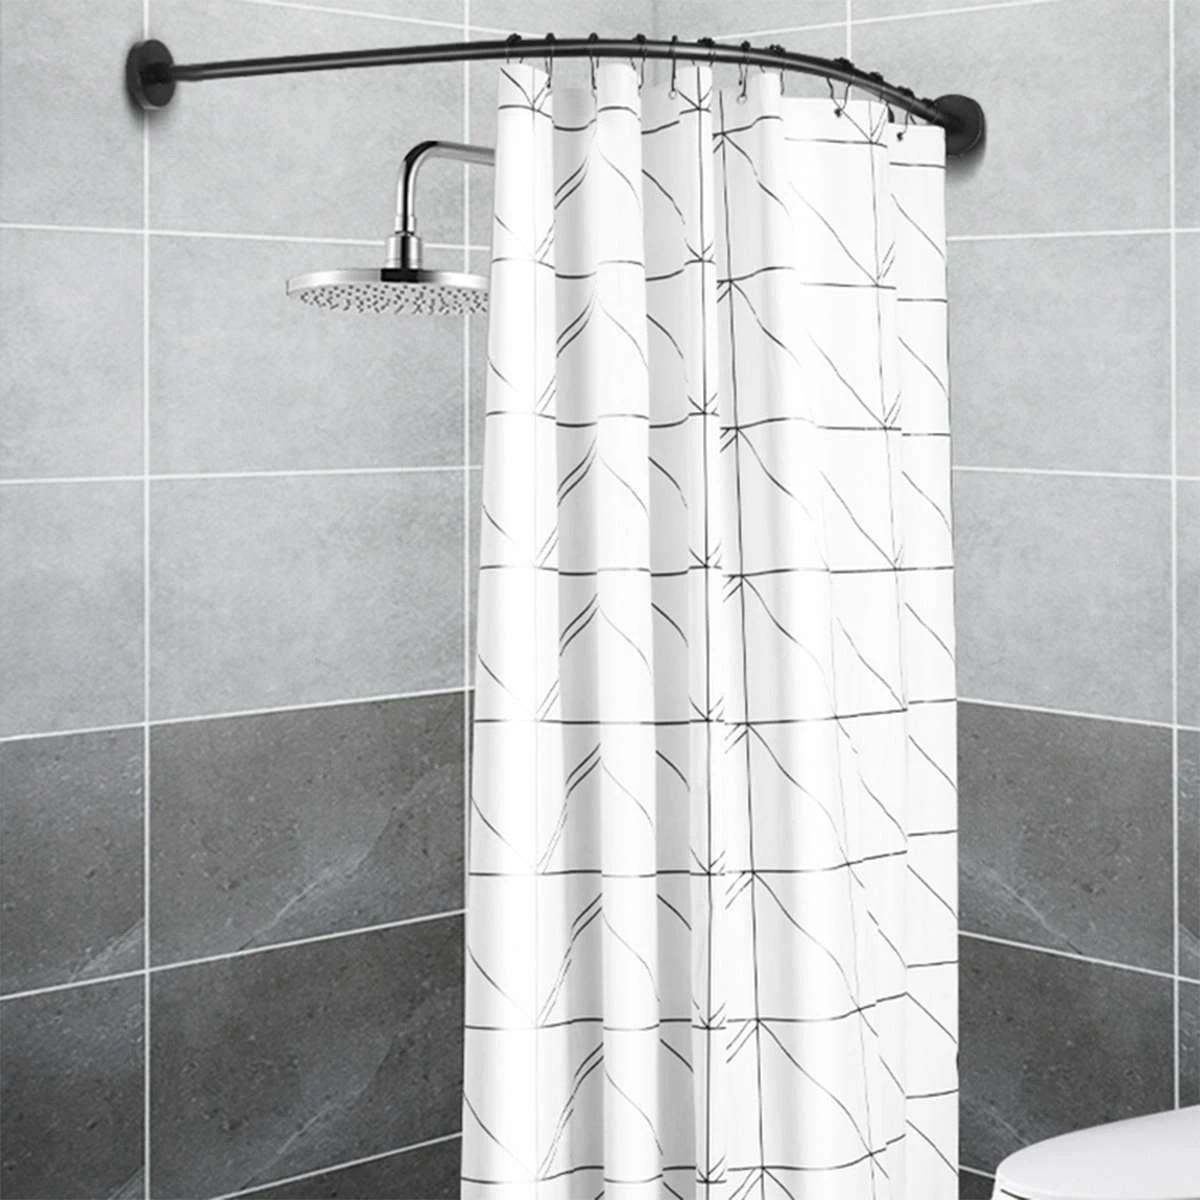 extendable corner shower curtain rod pole black stainless steel rail rod bar bath door hardware heavy loaded with 12 metal hooks